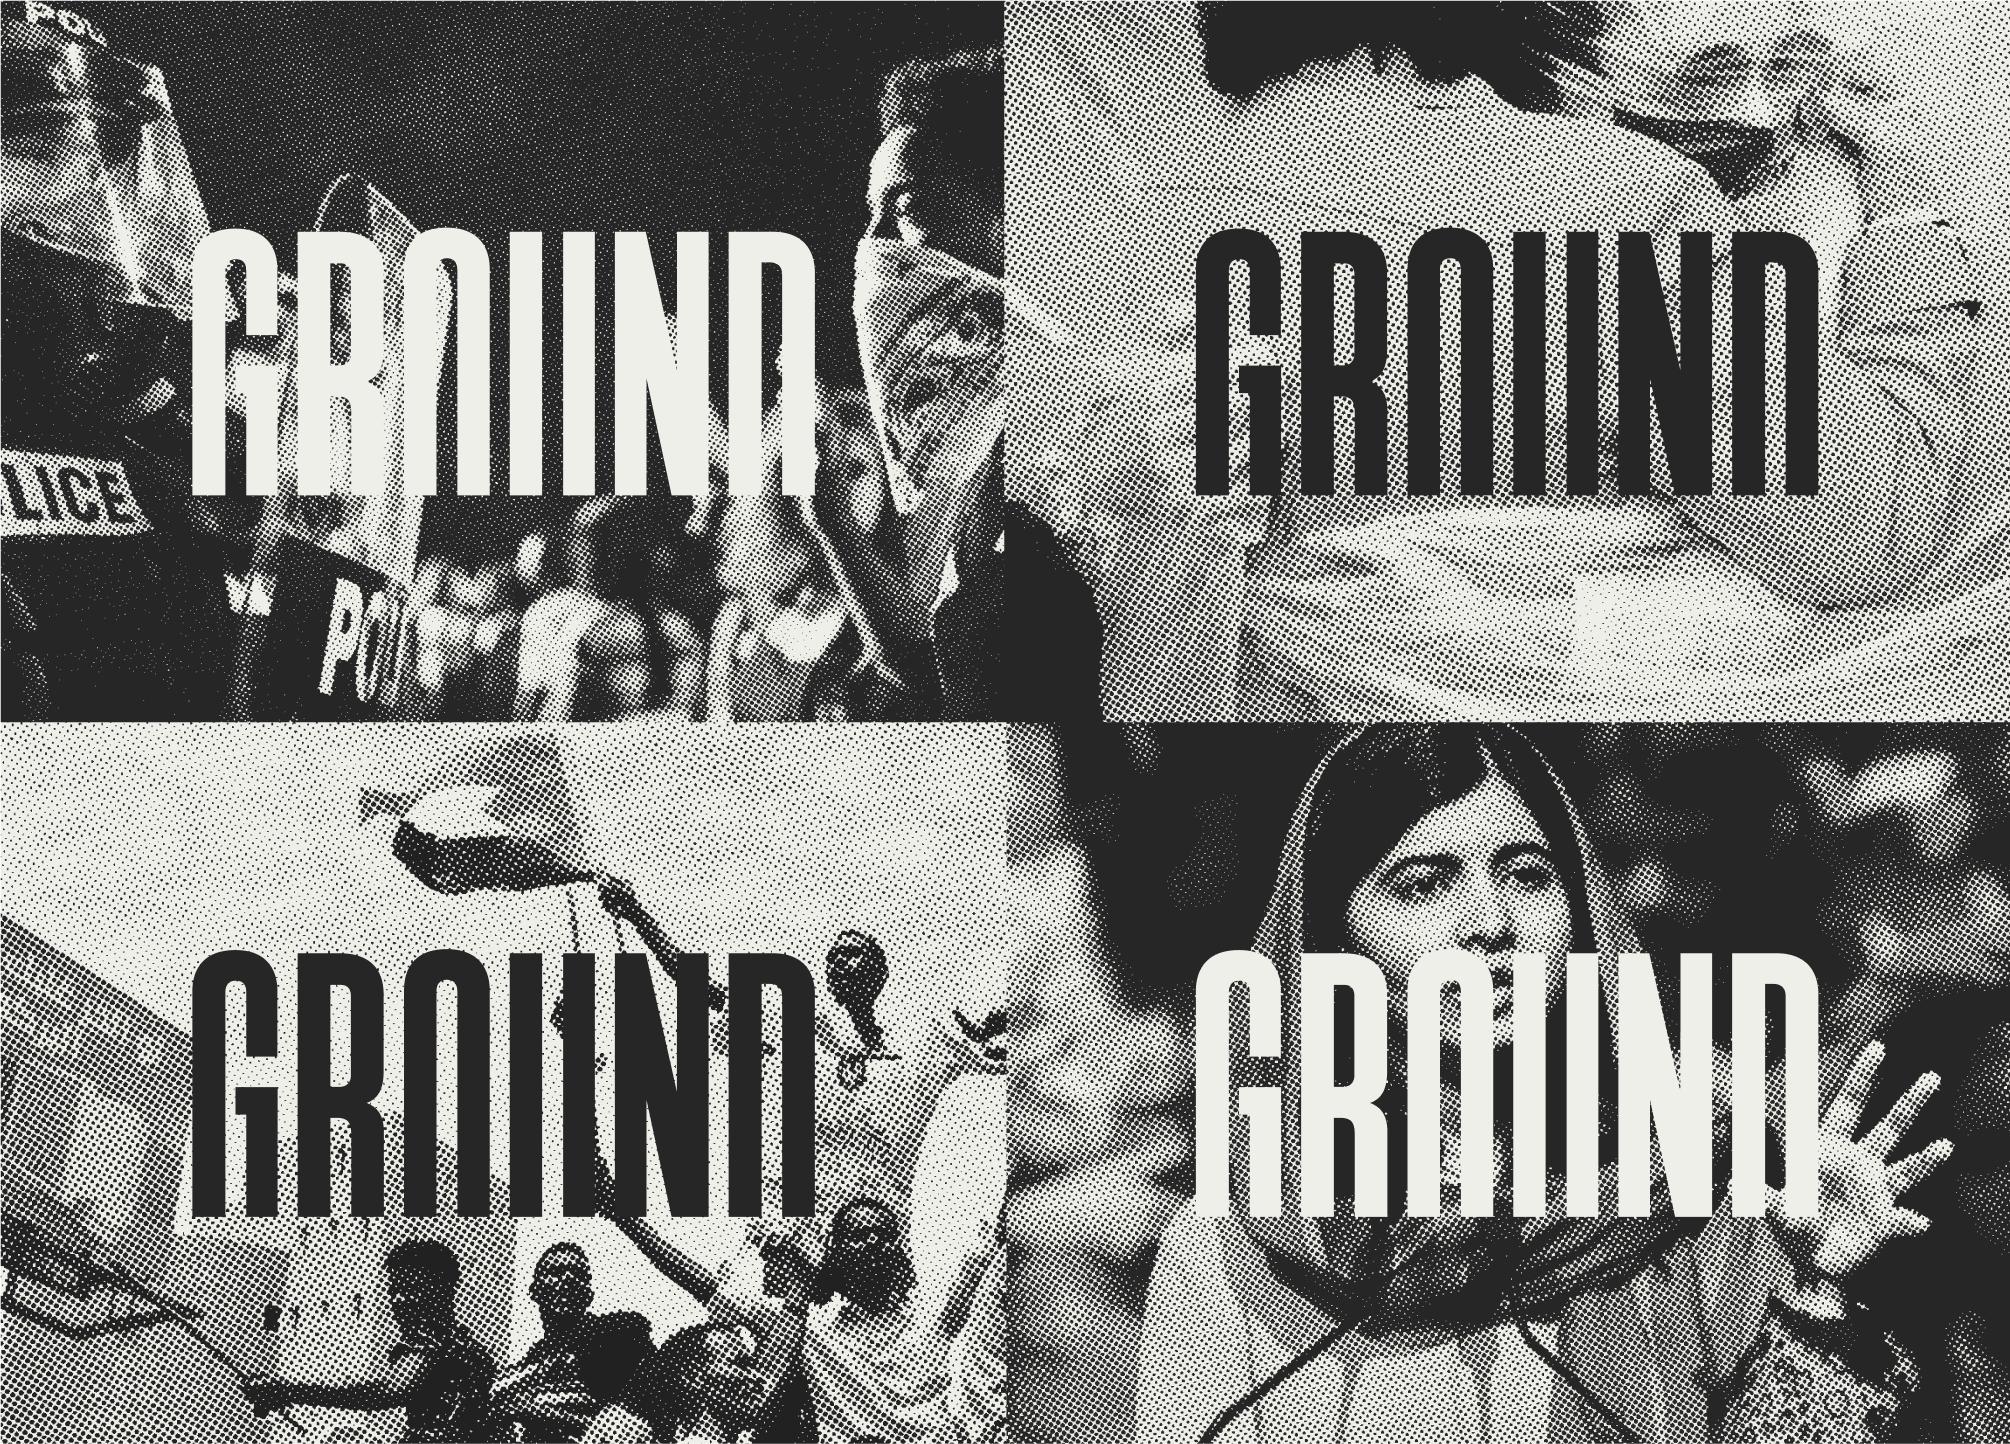 Ground-logo-on-images-1